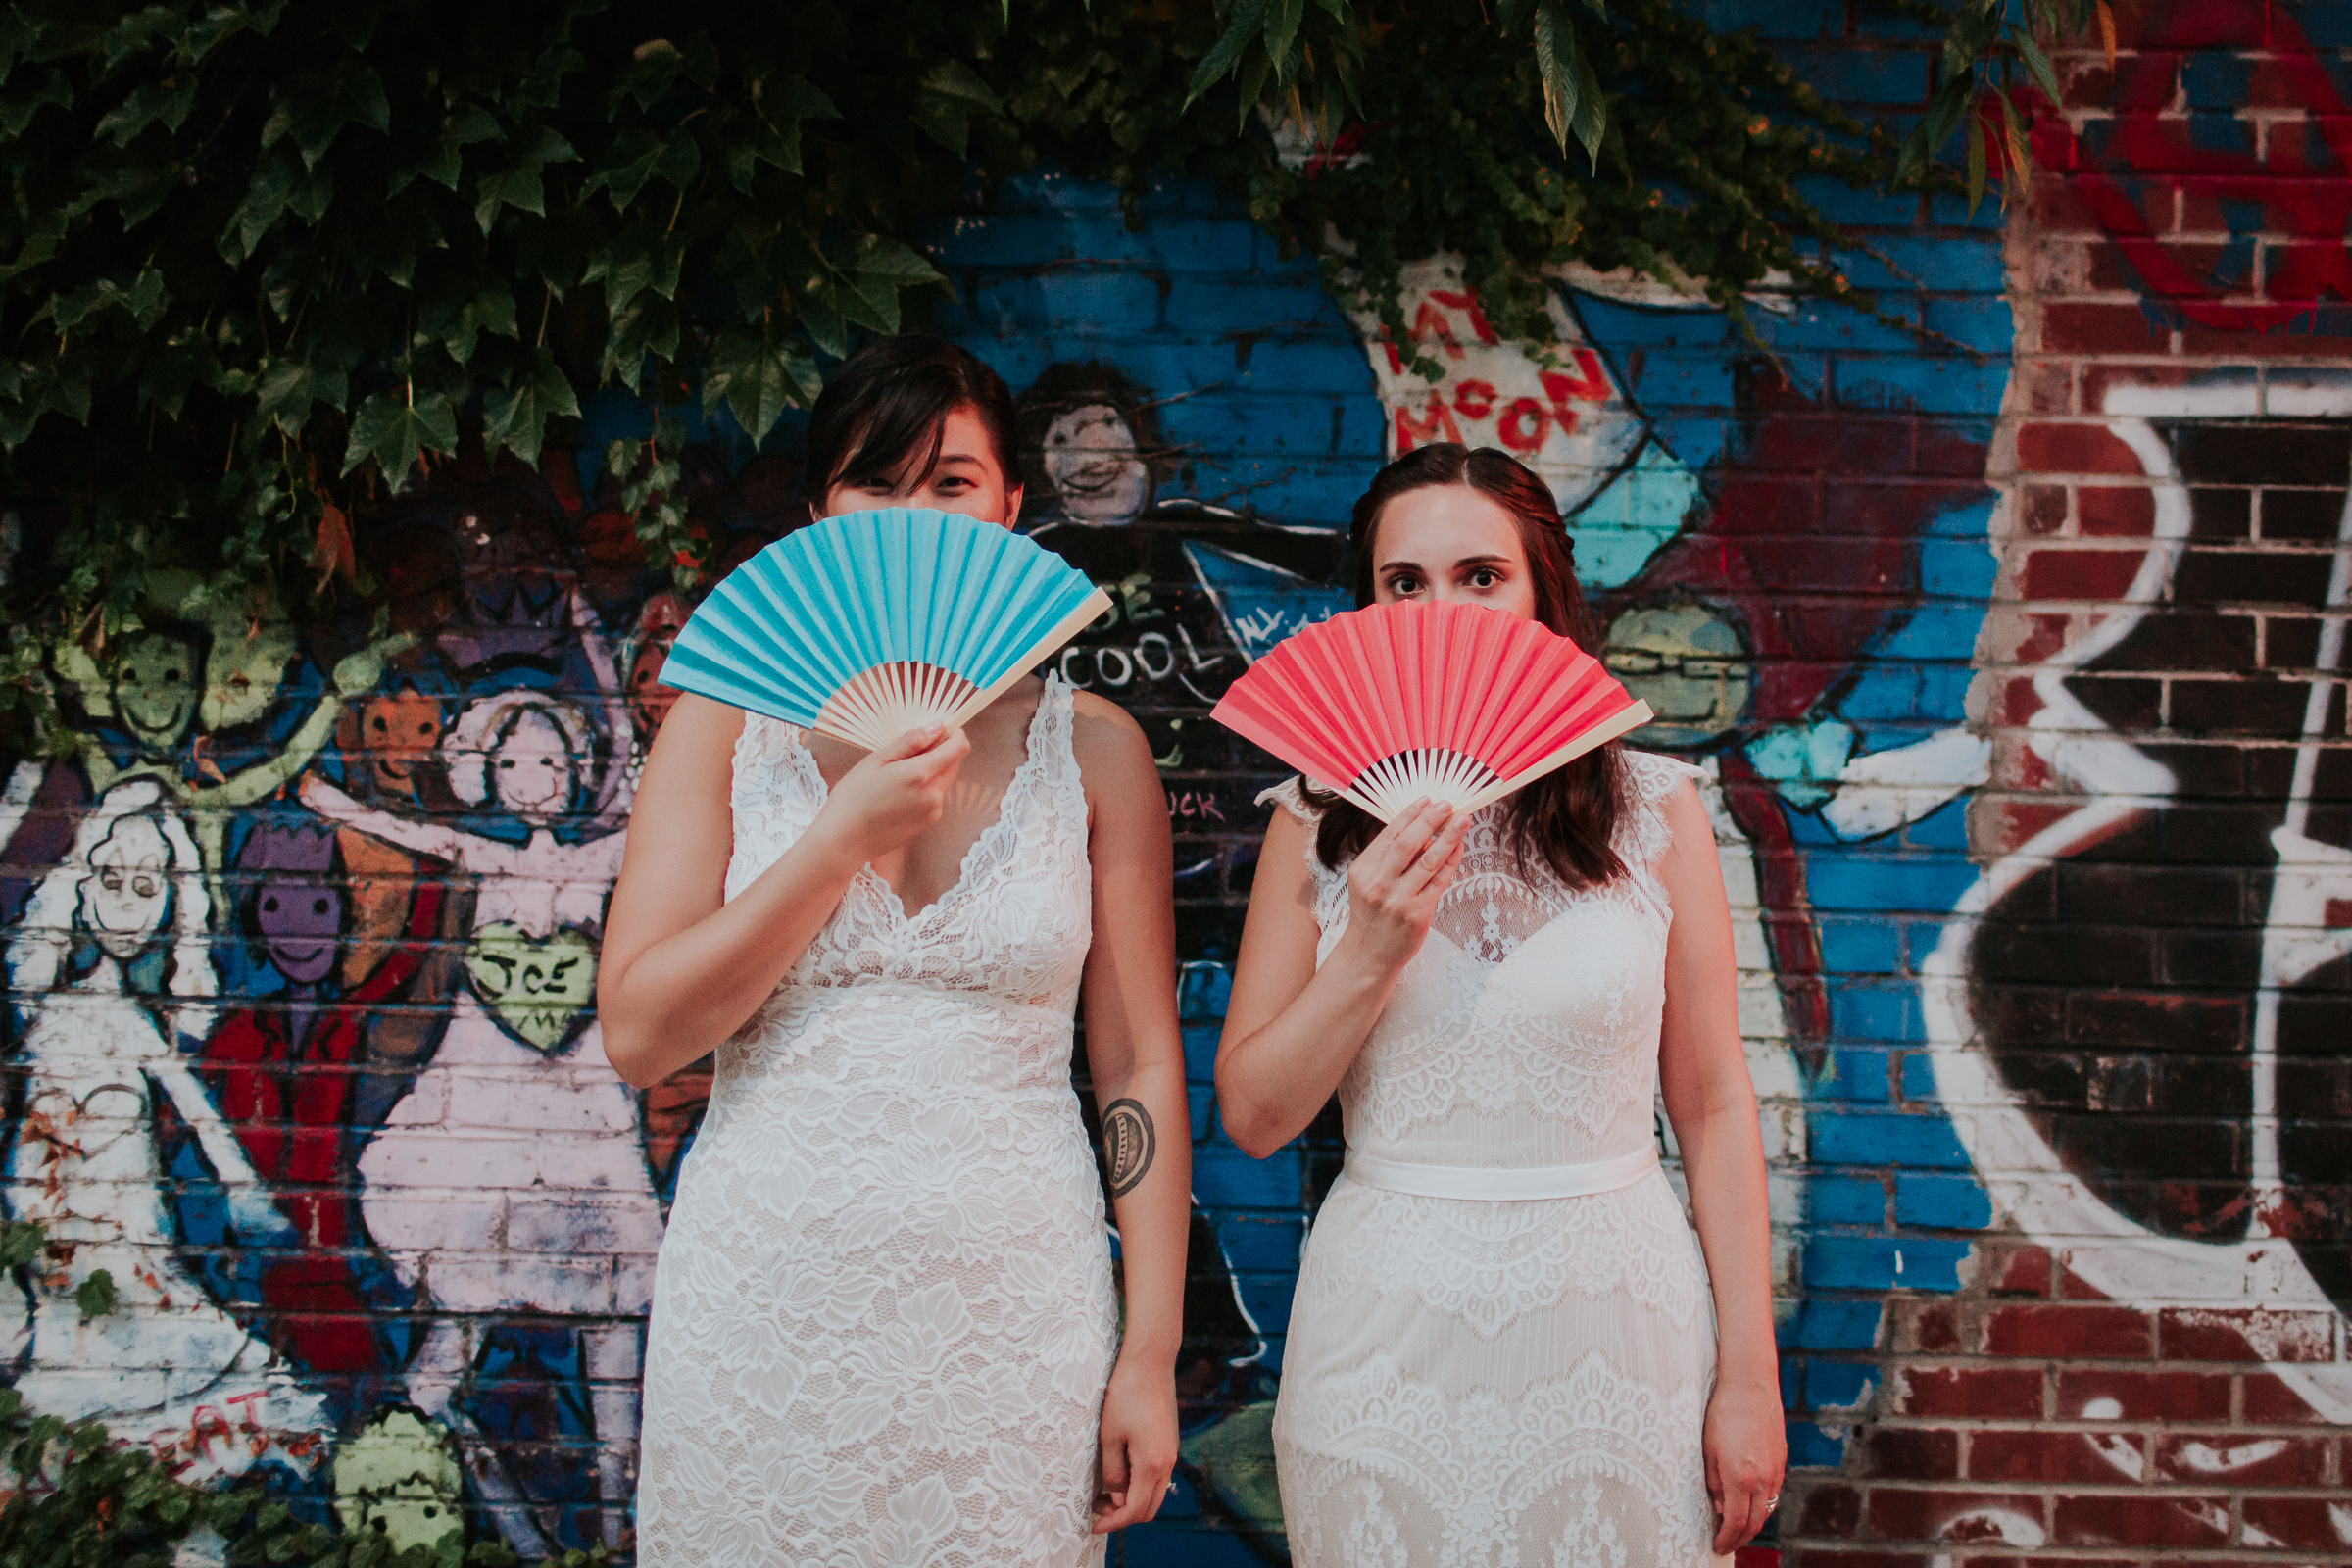 My-Moon-Brooklyn-LGBT-Gay-Documentary-Wedding-Photographer-103.jpg